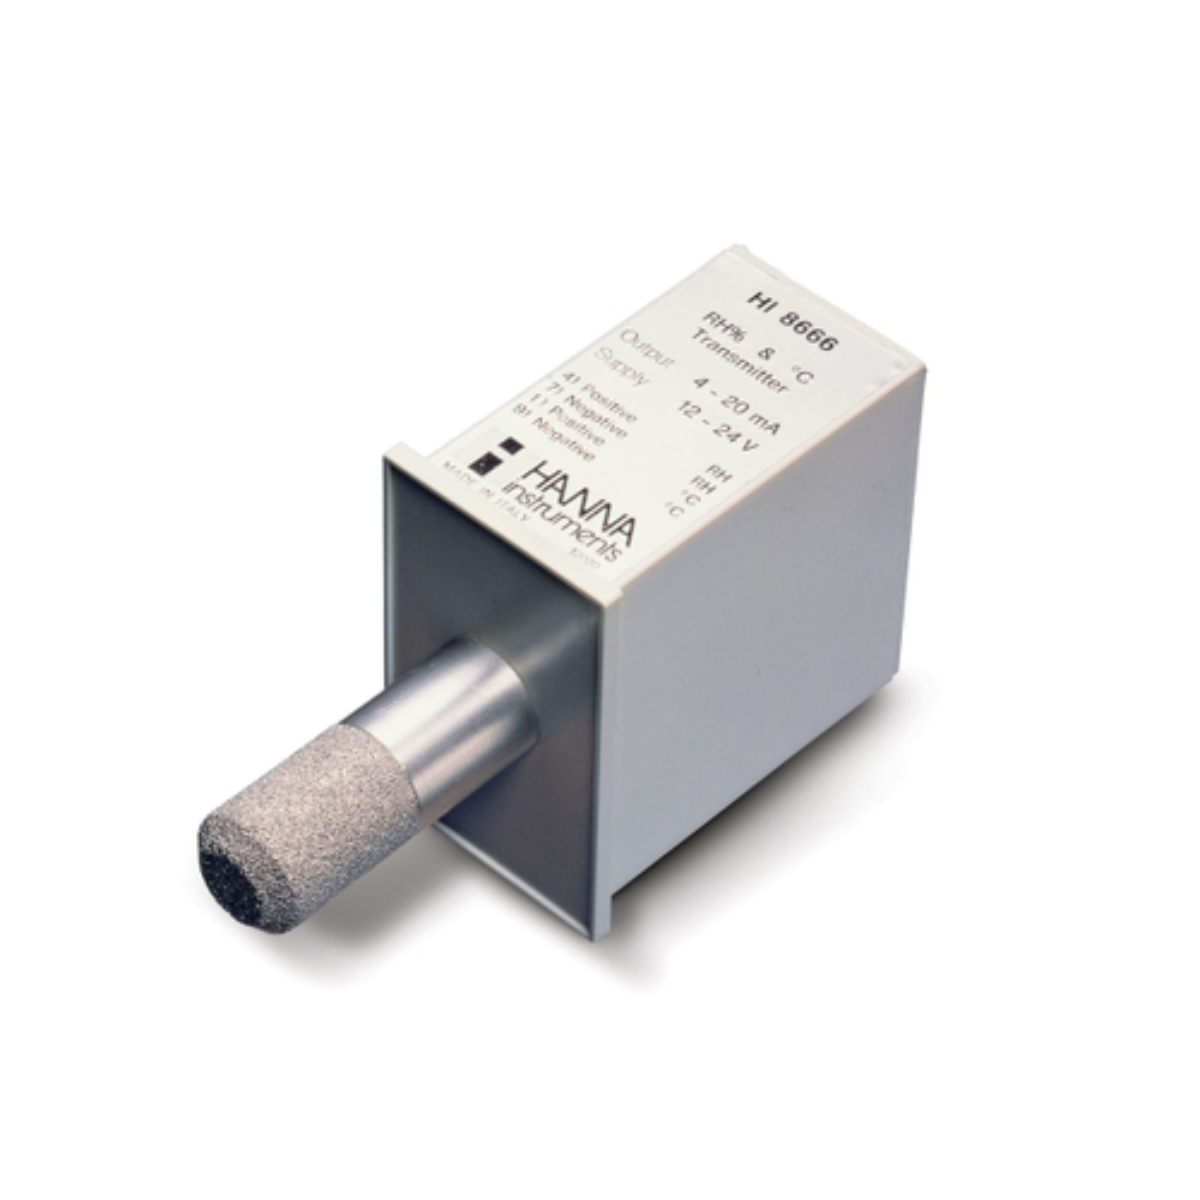 Relative Humidity and Temperature Transmitter - HI8666